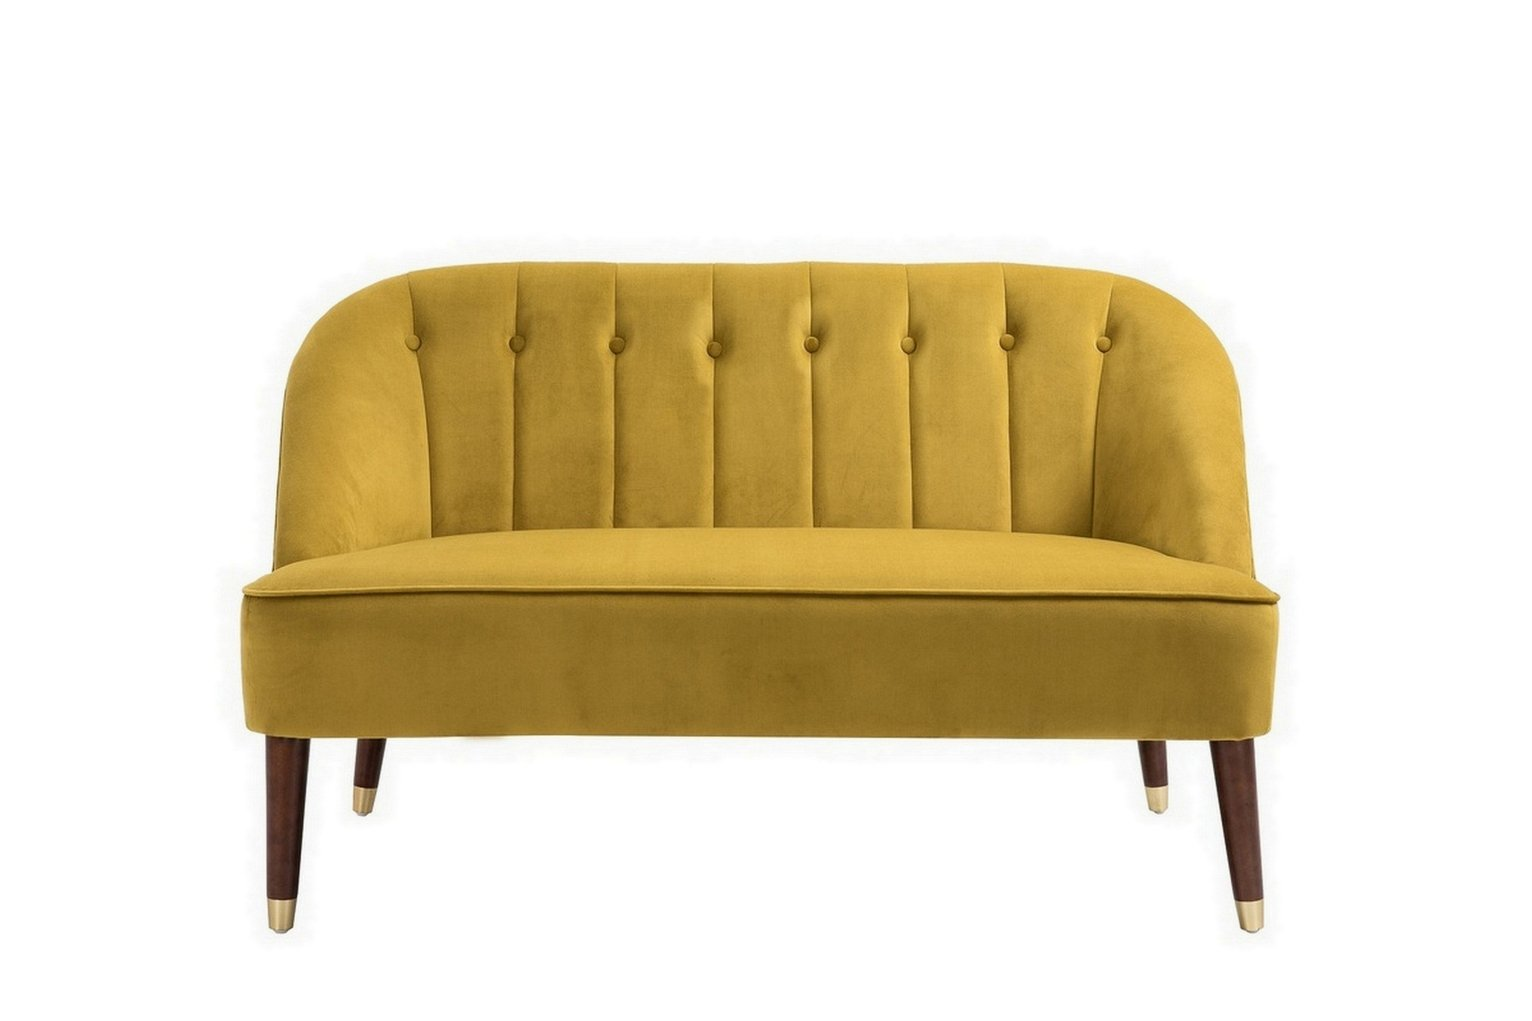 Birlea Alexa 2 Seater Fabric Sofa - Mustard